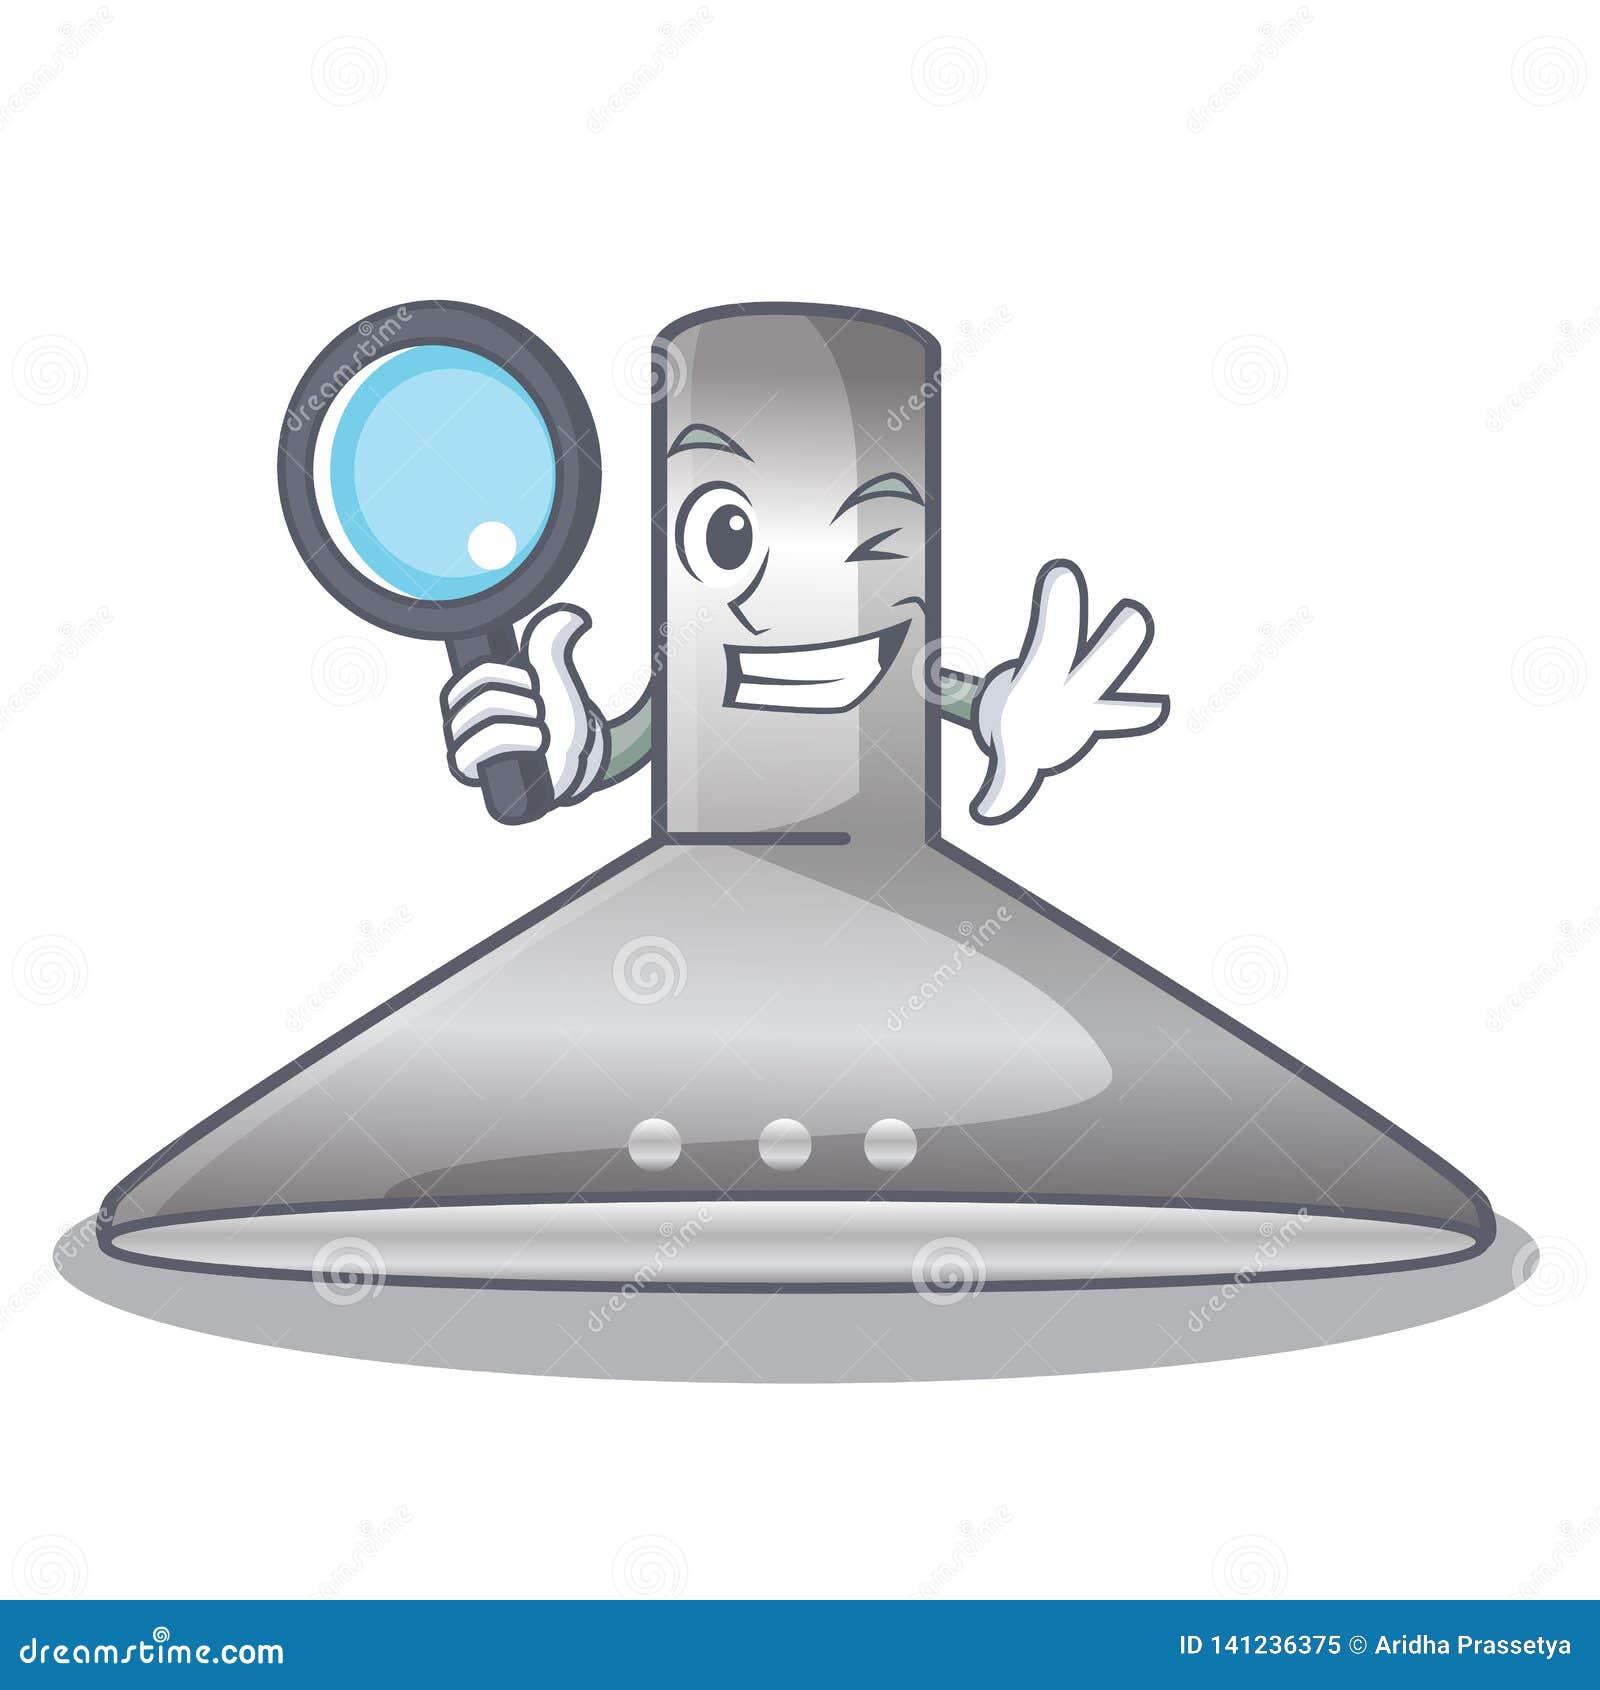 Detective kichen hood in the mascot shape